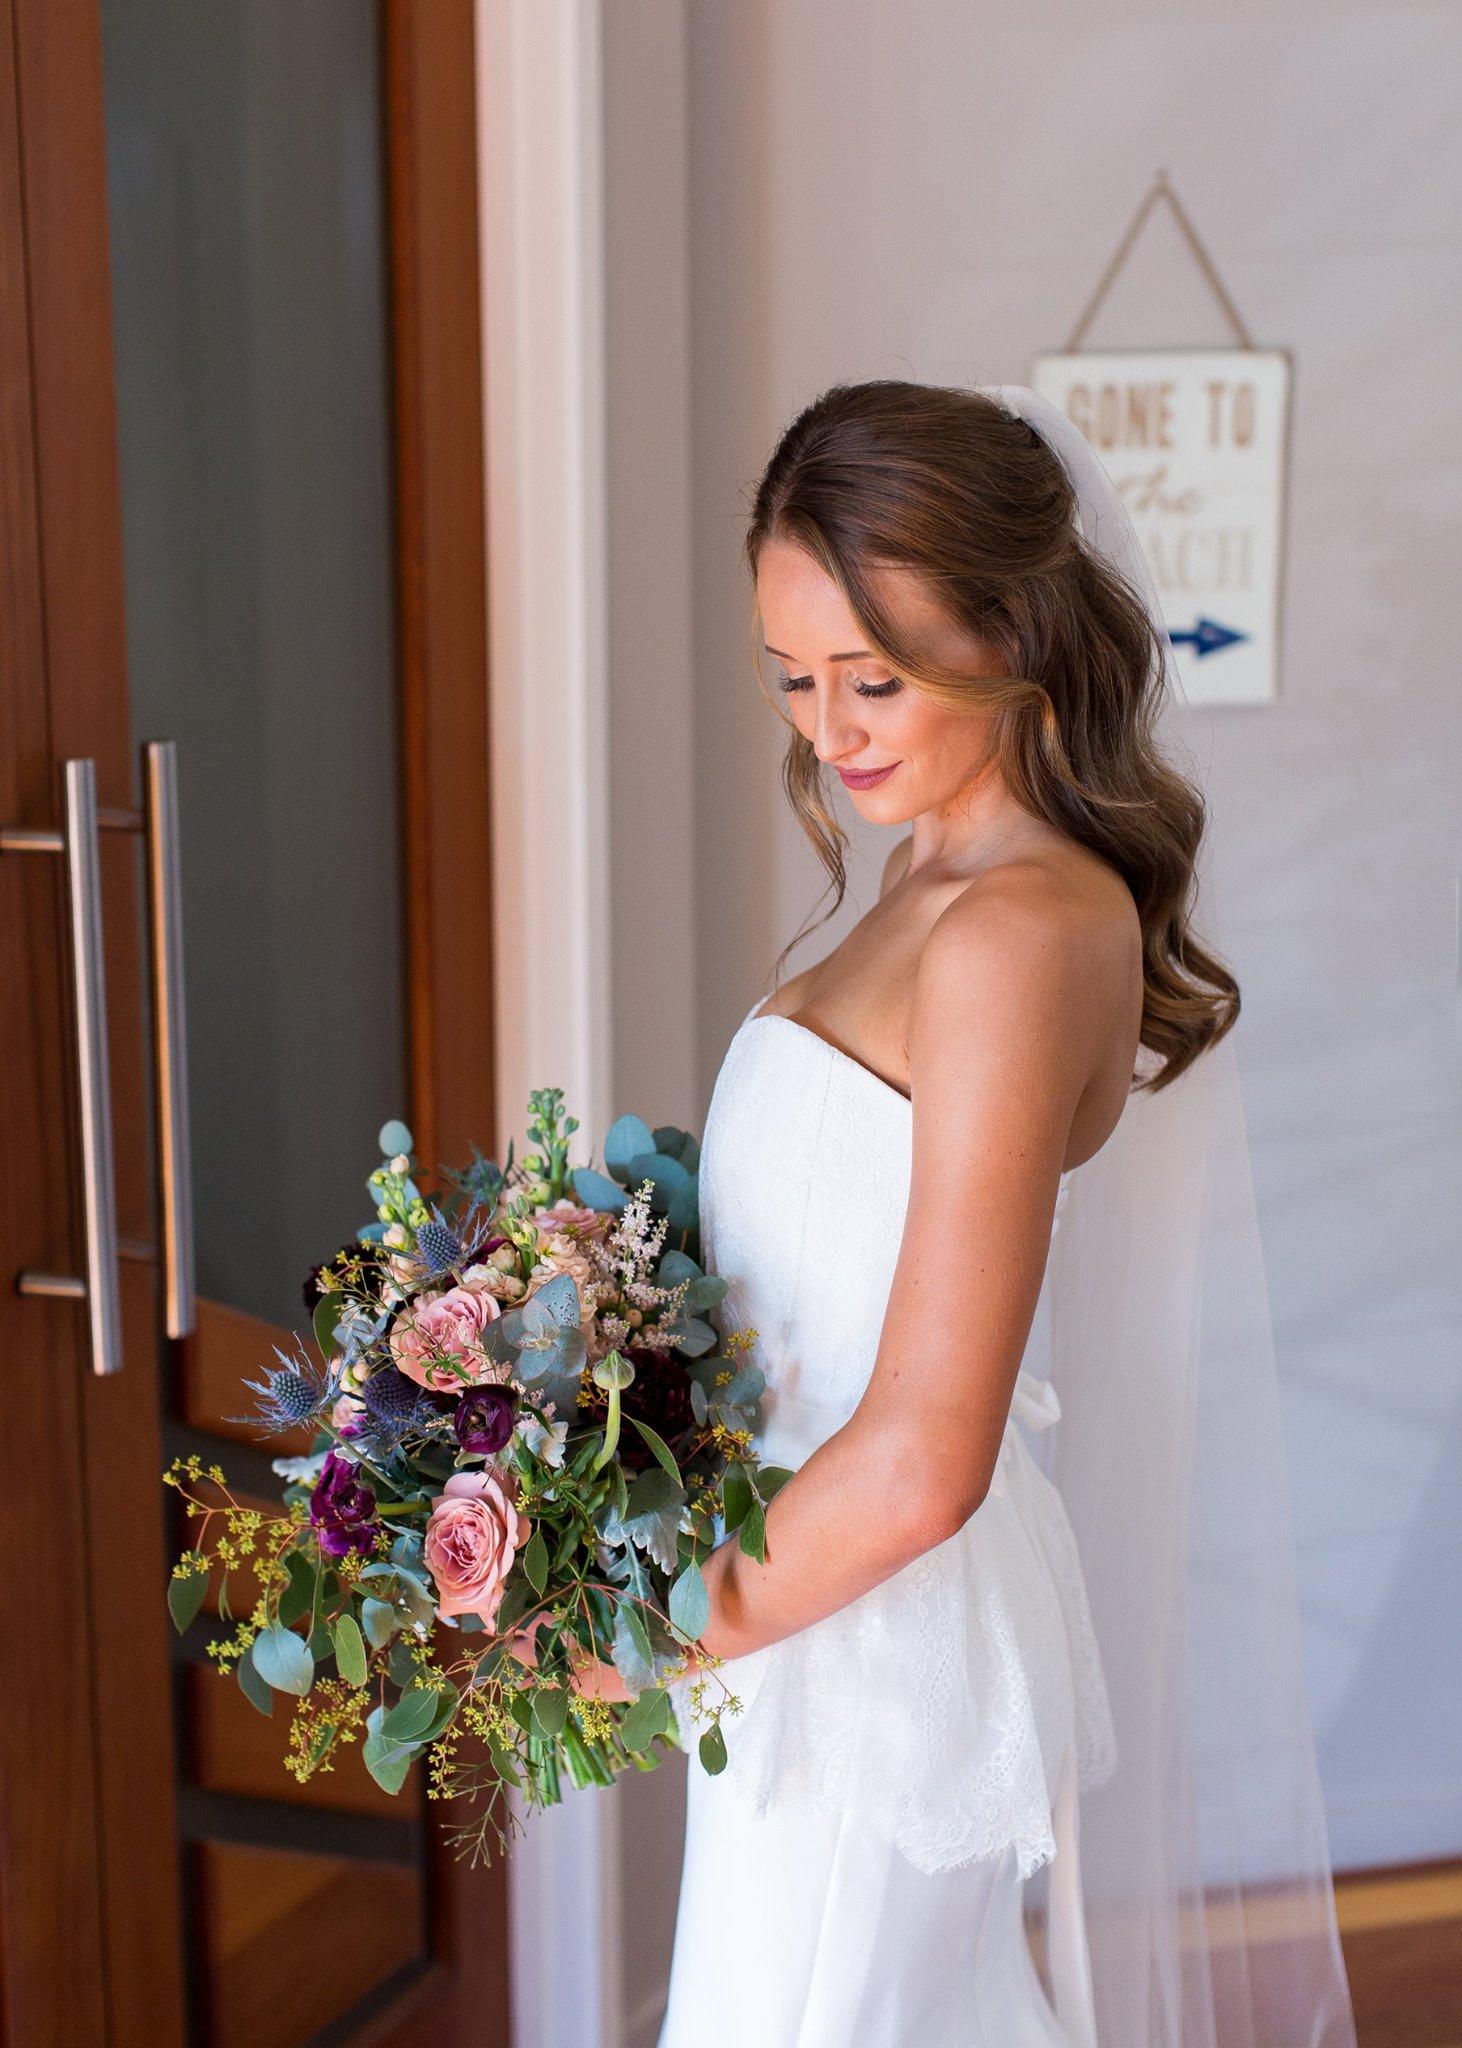 wedding-hair-and-makeup-1.jpg